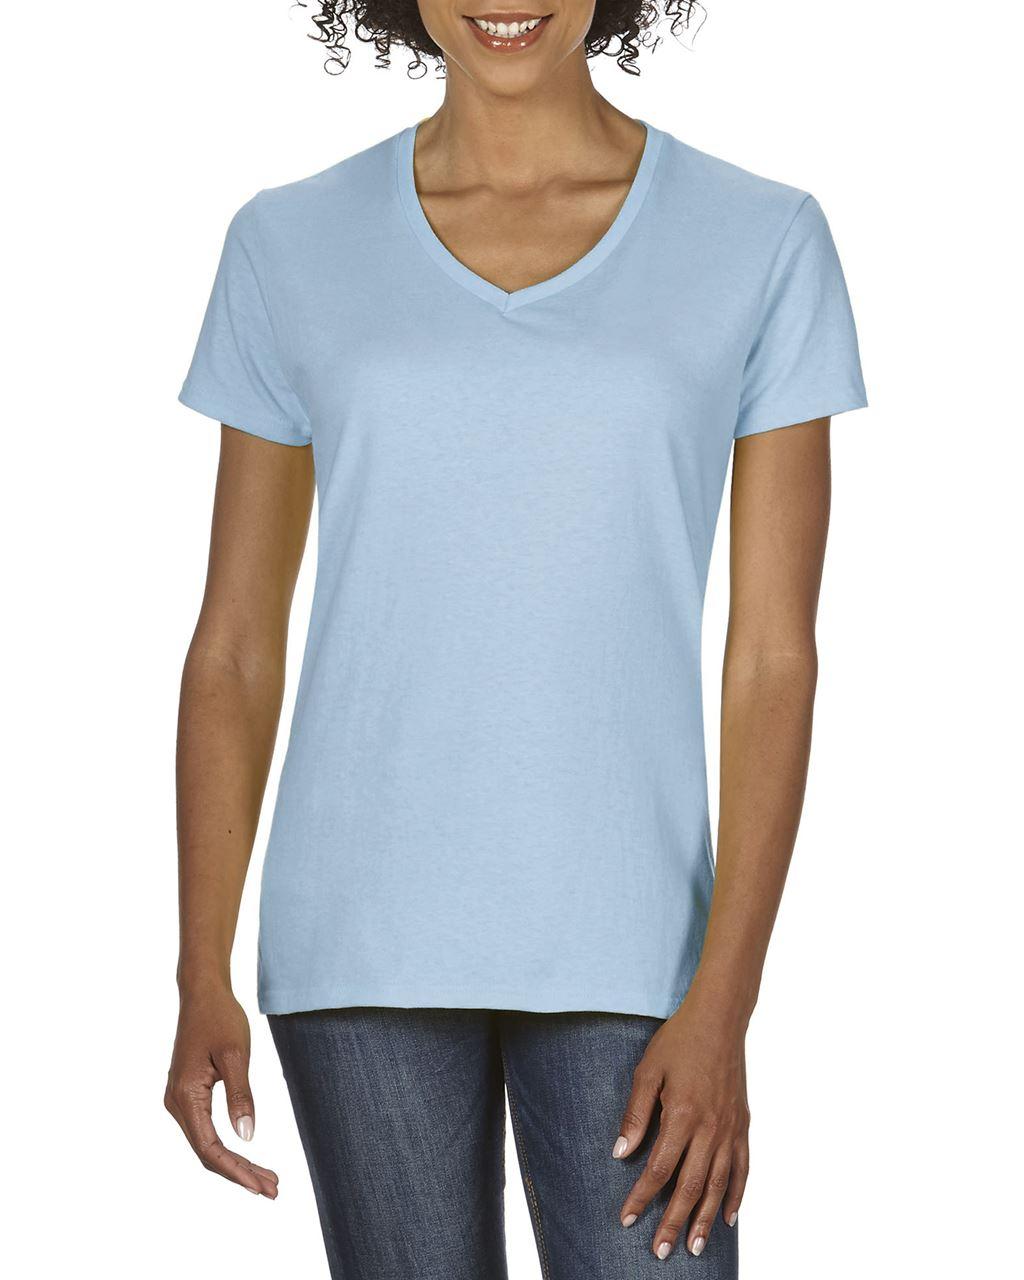 Tricou dama cu guler in V Gildan Premium Cotton bumbac 185 g/mp serigrafie termotransfer broderie DTG | Toroadv.ro